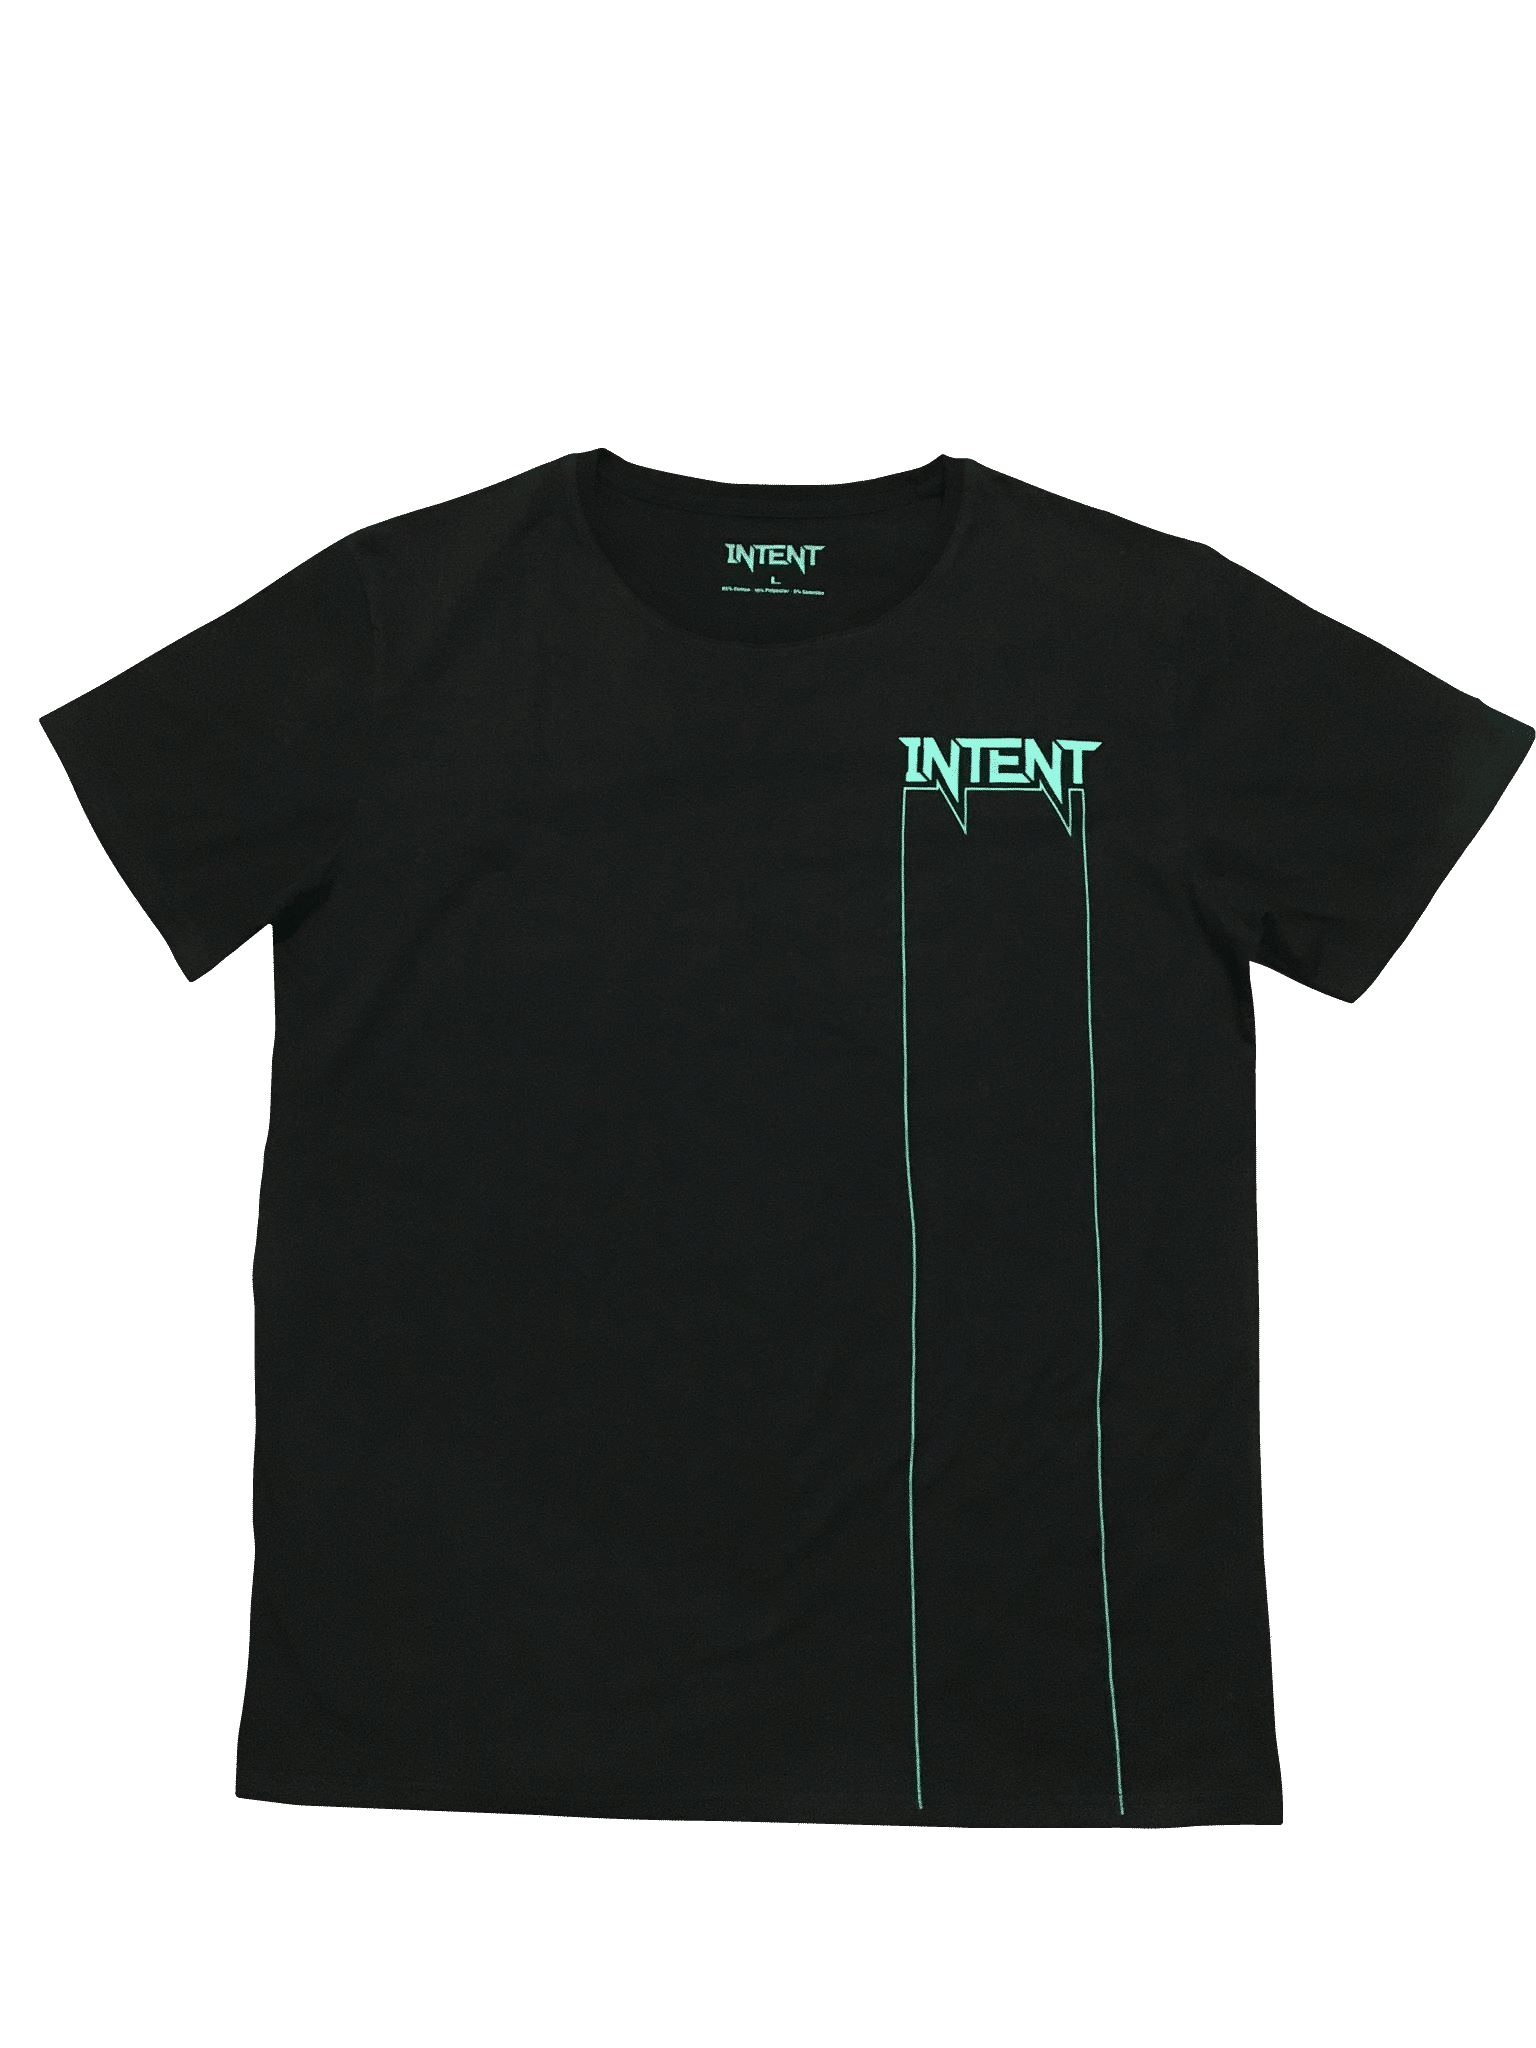 Black/Teal intent Mx Staple. Shirt